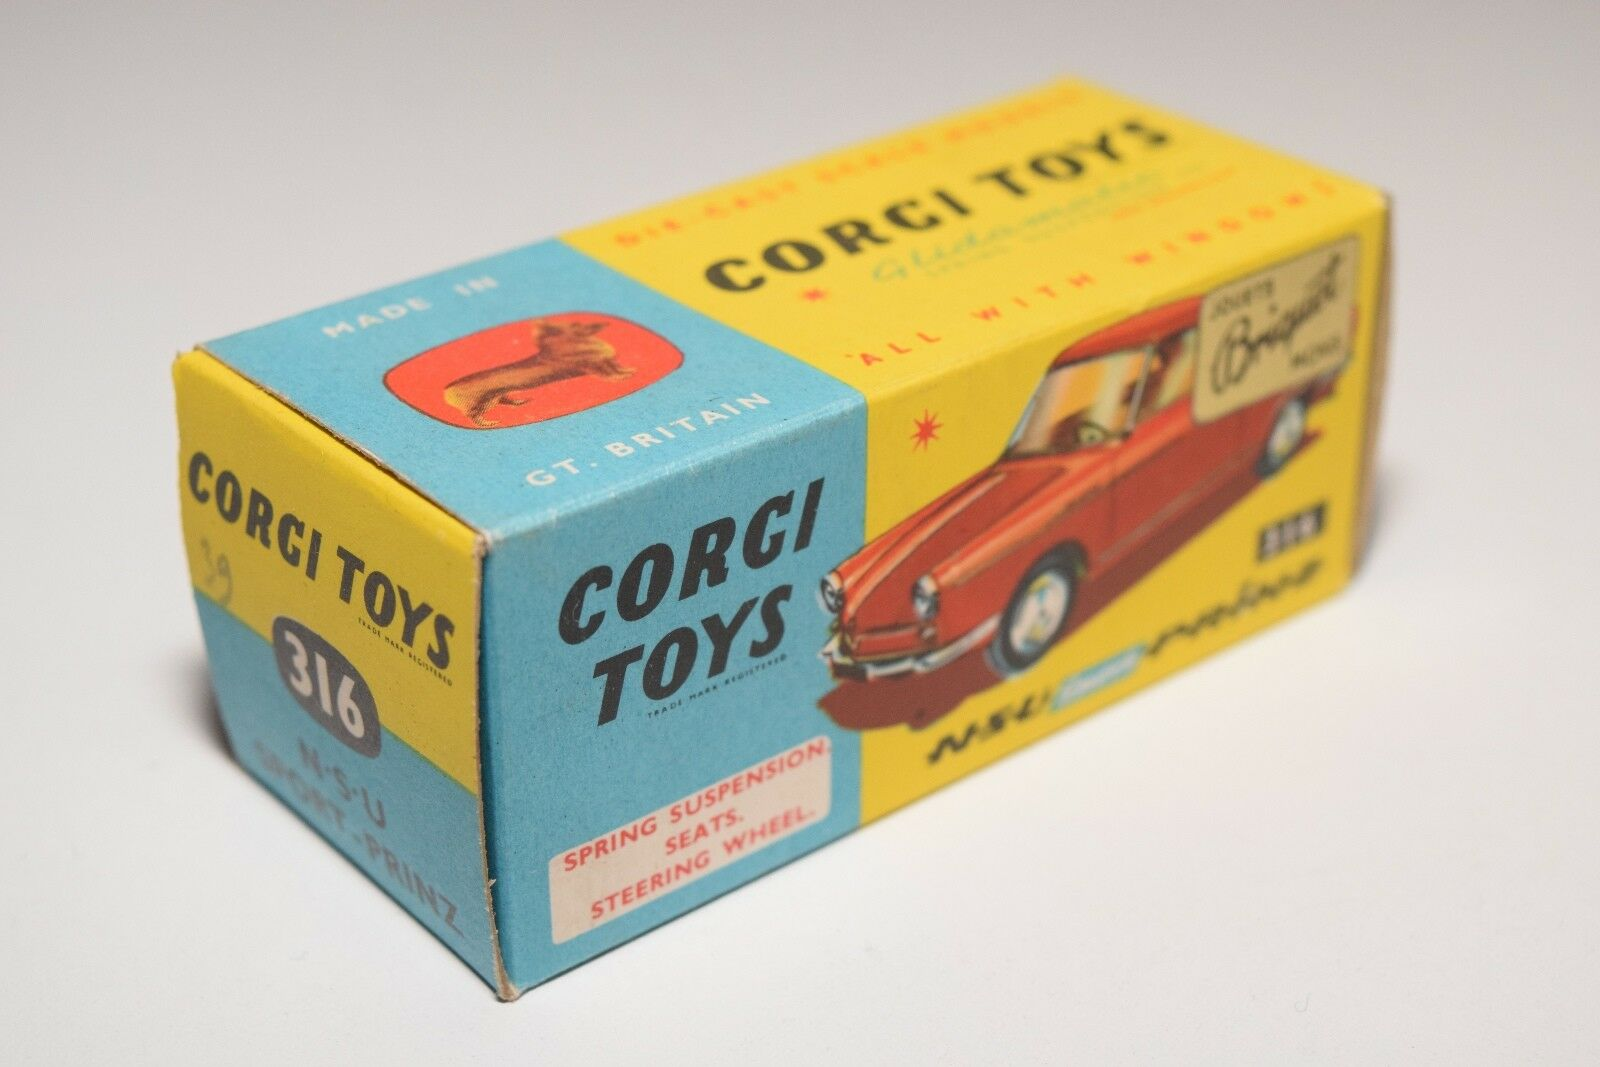 43 CORGI TOYS 316 ORIGINAL EMPTY BOX NSU SPORT PRINZ NEAR MINT CONDITION